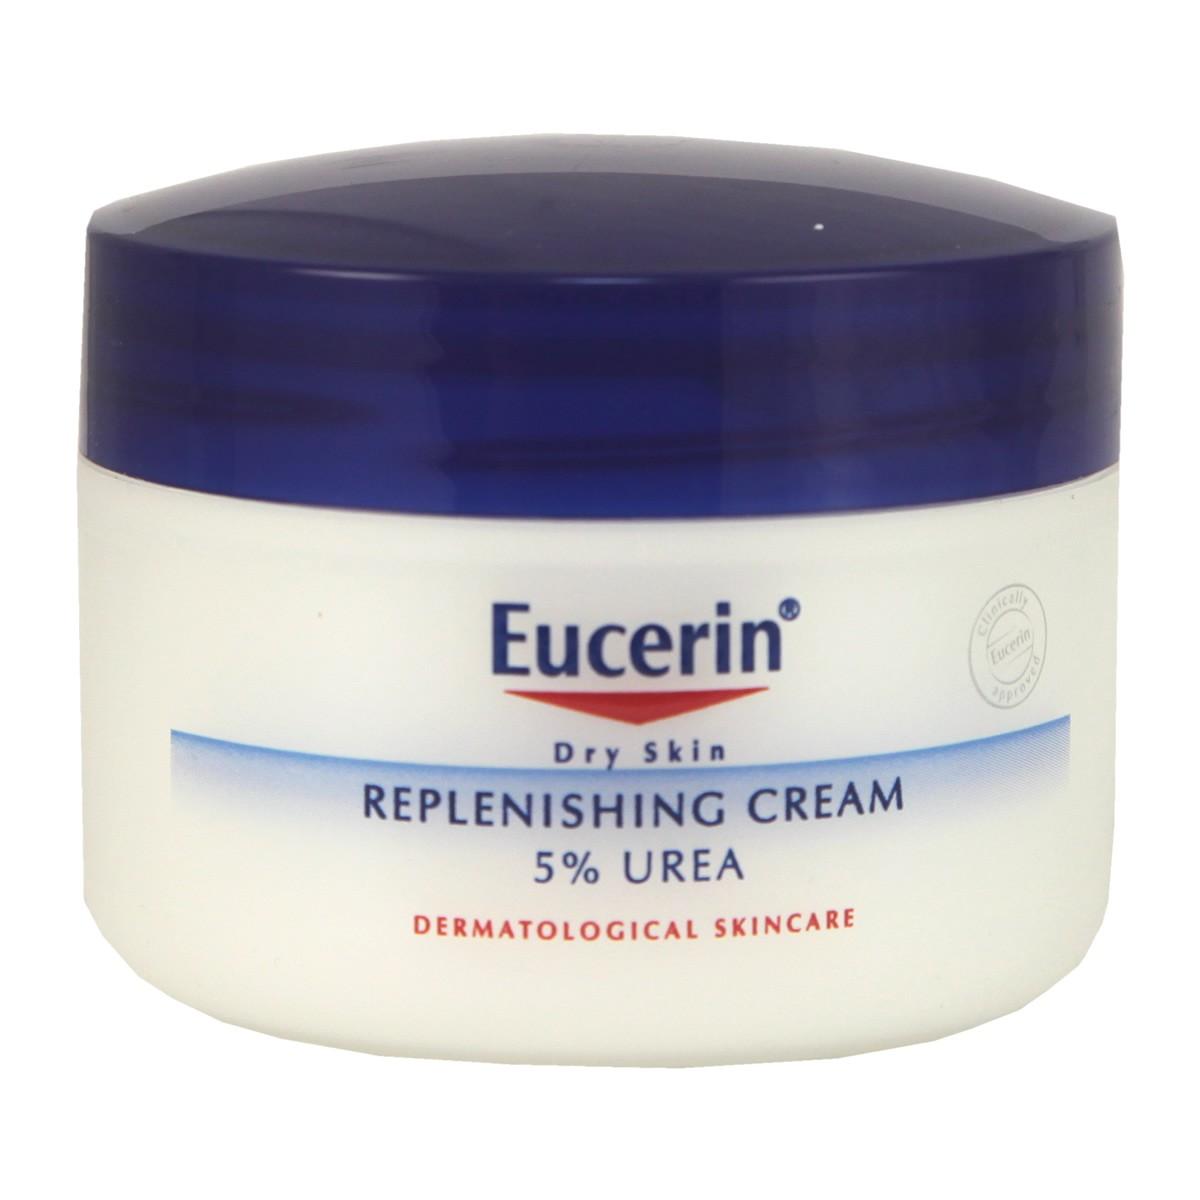 Eucerin Replenishing Cream 5% Urea with Lactate & Carnitine